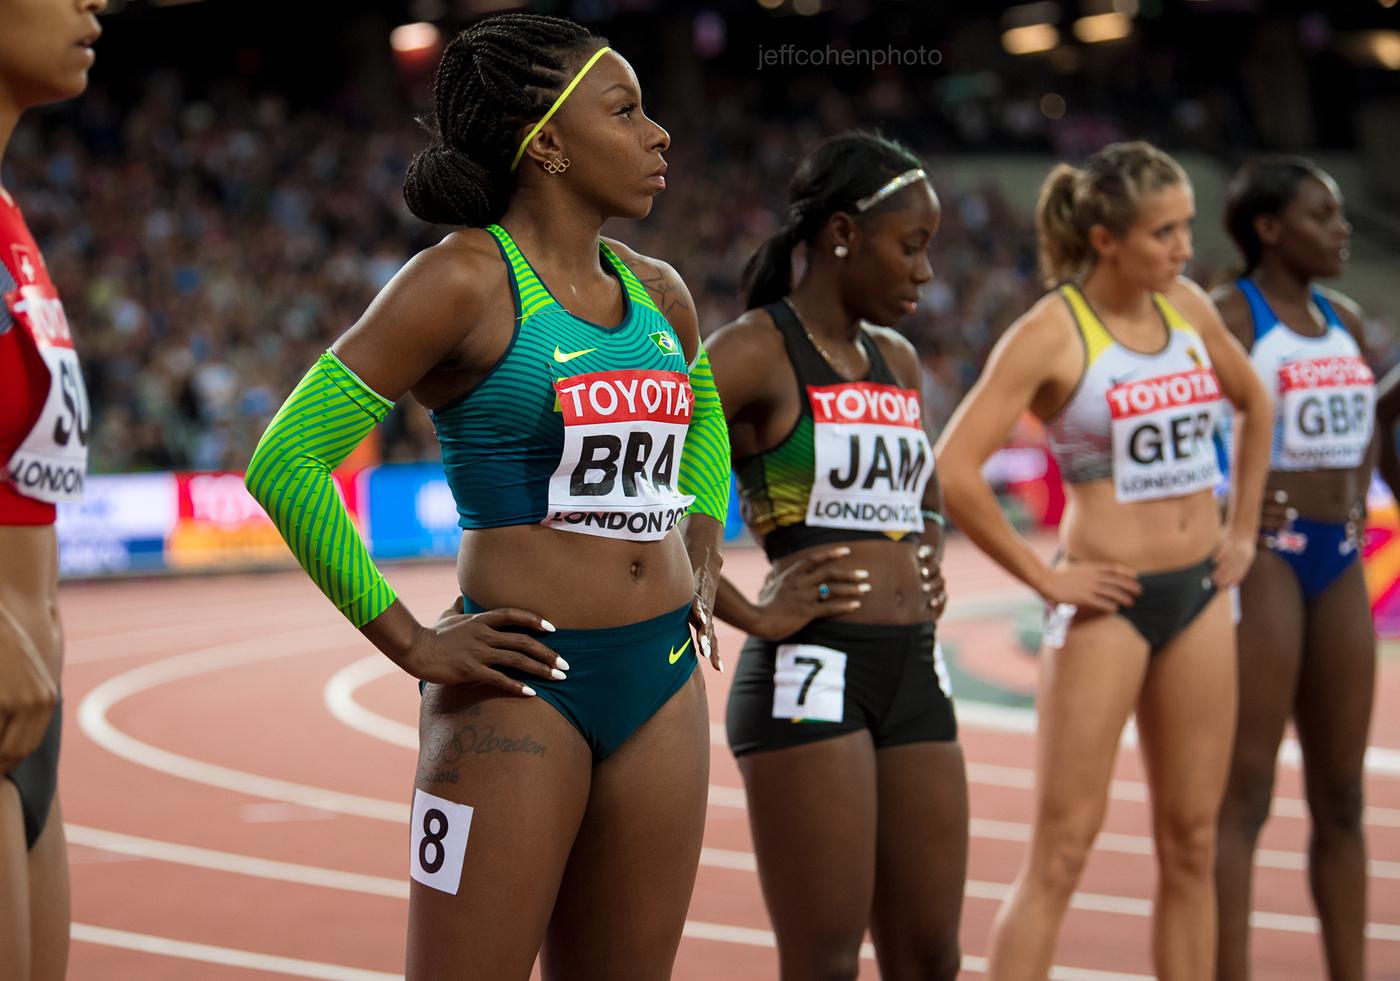 2017-IAAF-WC-London-night-9-rosangela-santos-bra-4x100w--2534--jeff-cohen-photo--web.jpg